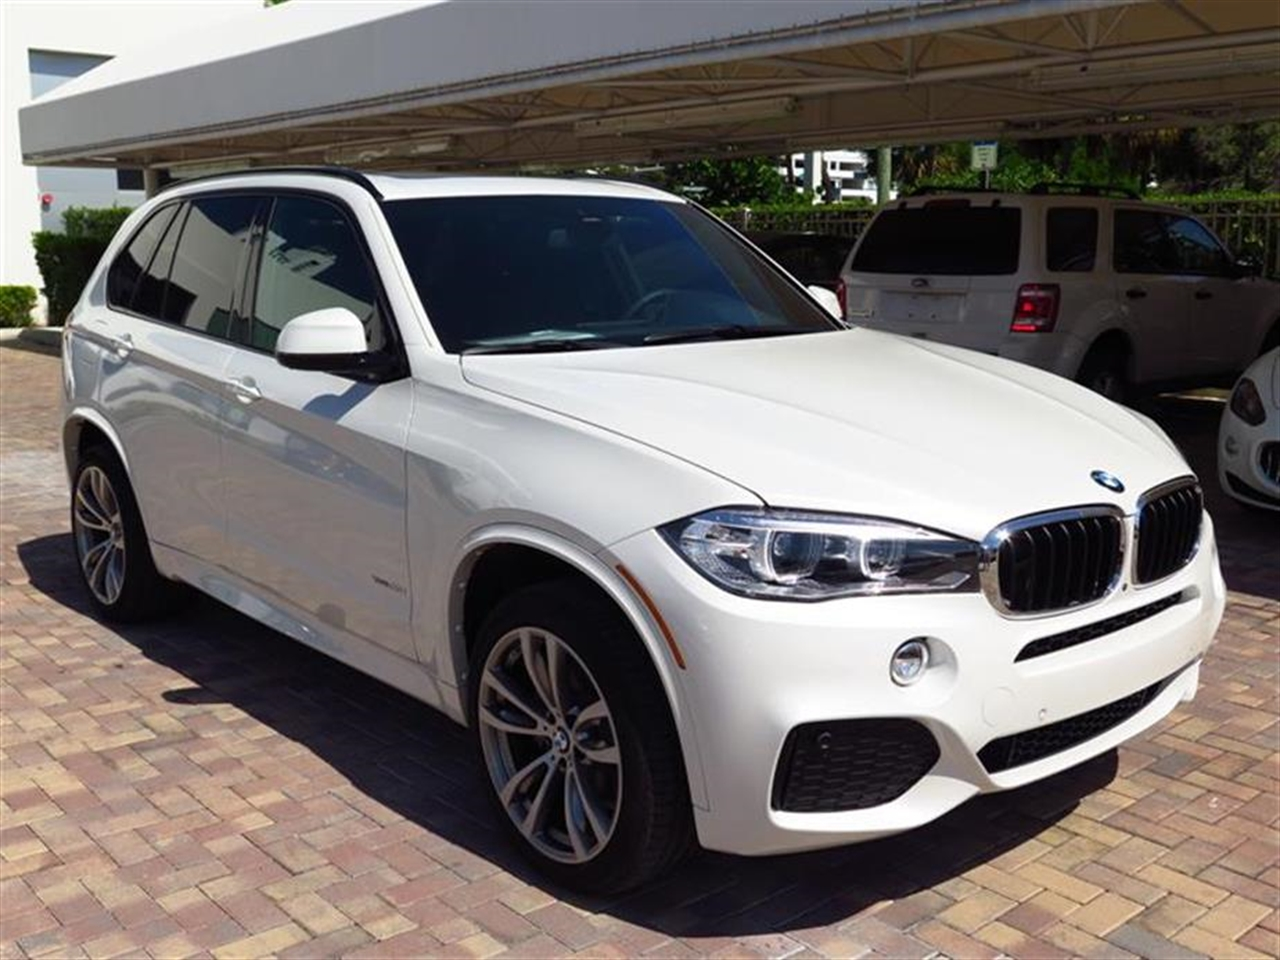 2015 BMW X5 AWD 4dr xDrive35i 2712 miles VIN 5UXKR0C5XF0K60578